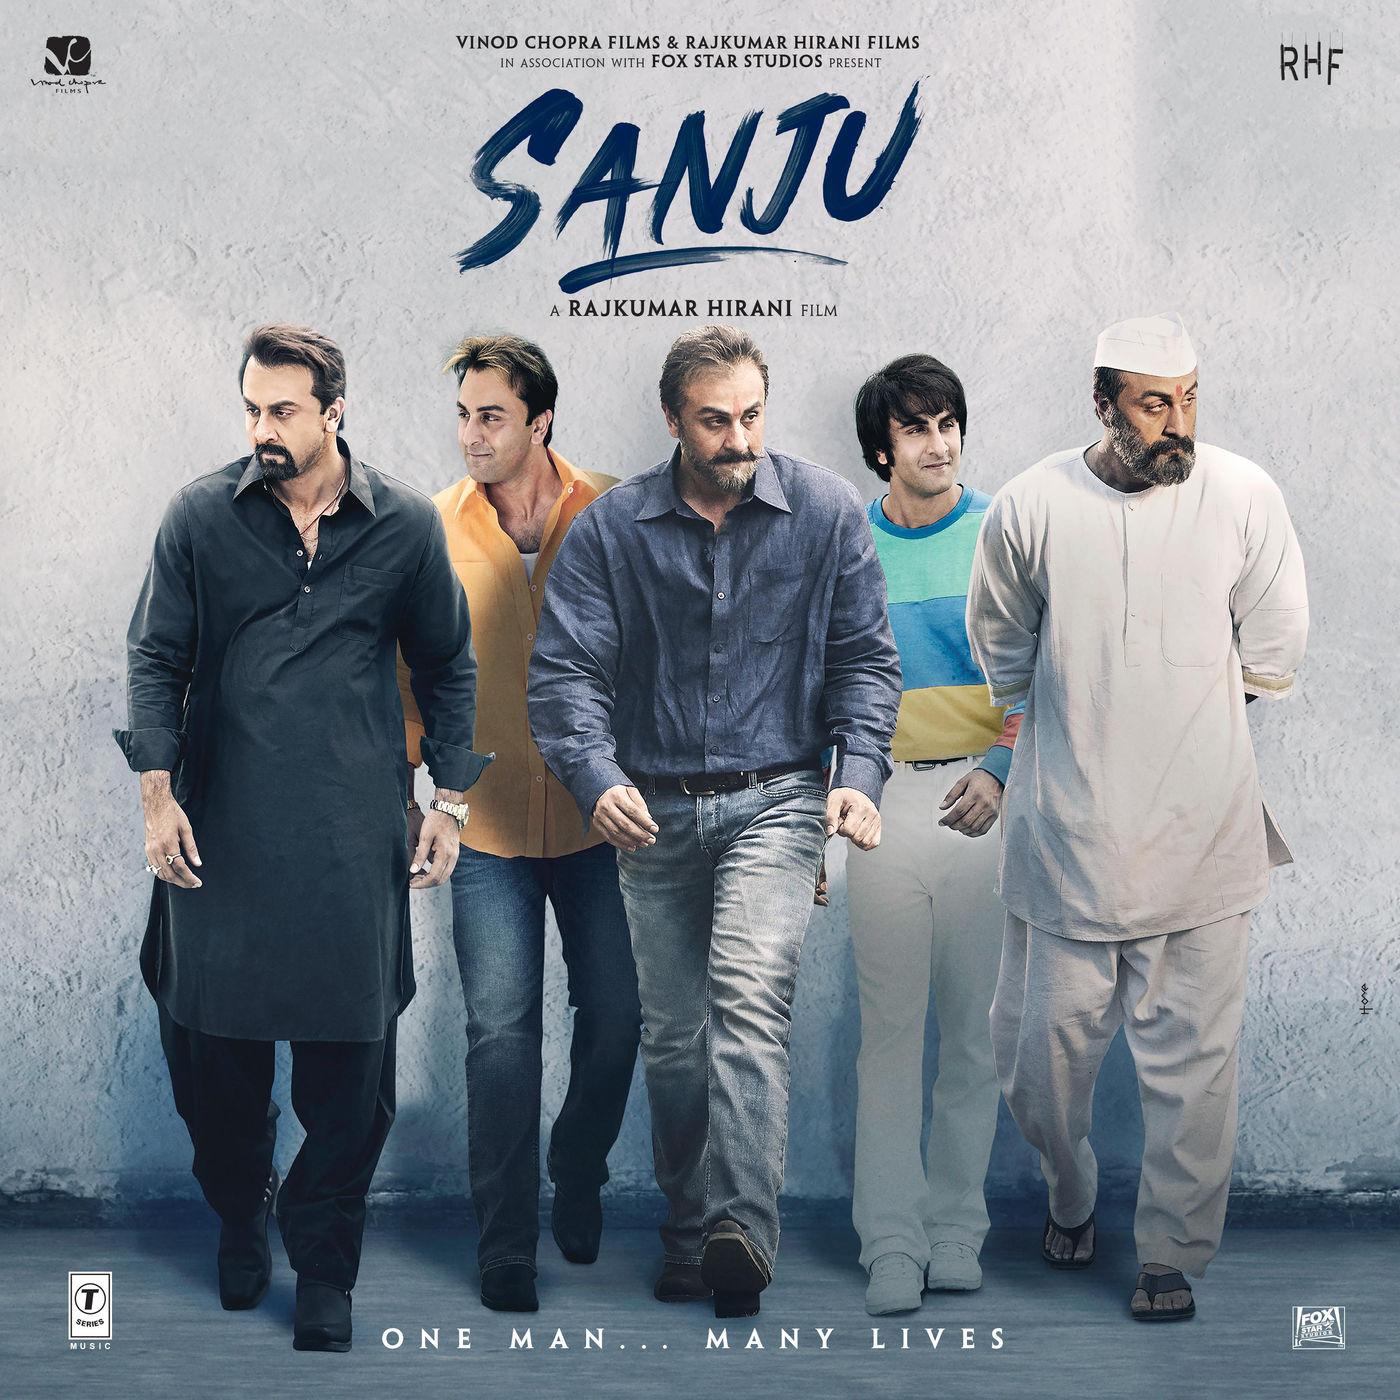 Rohan-Rohan, Vikram Montrose & A. R. Rahman – Sanju (Original Motion Picture Soundtrack) – EP [iTunes Match M4A] | iplusall.4fullz.com